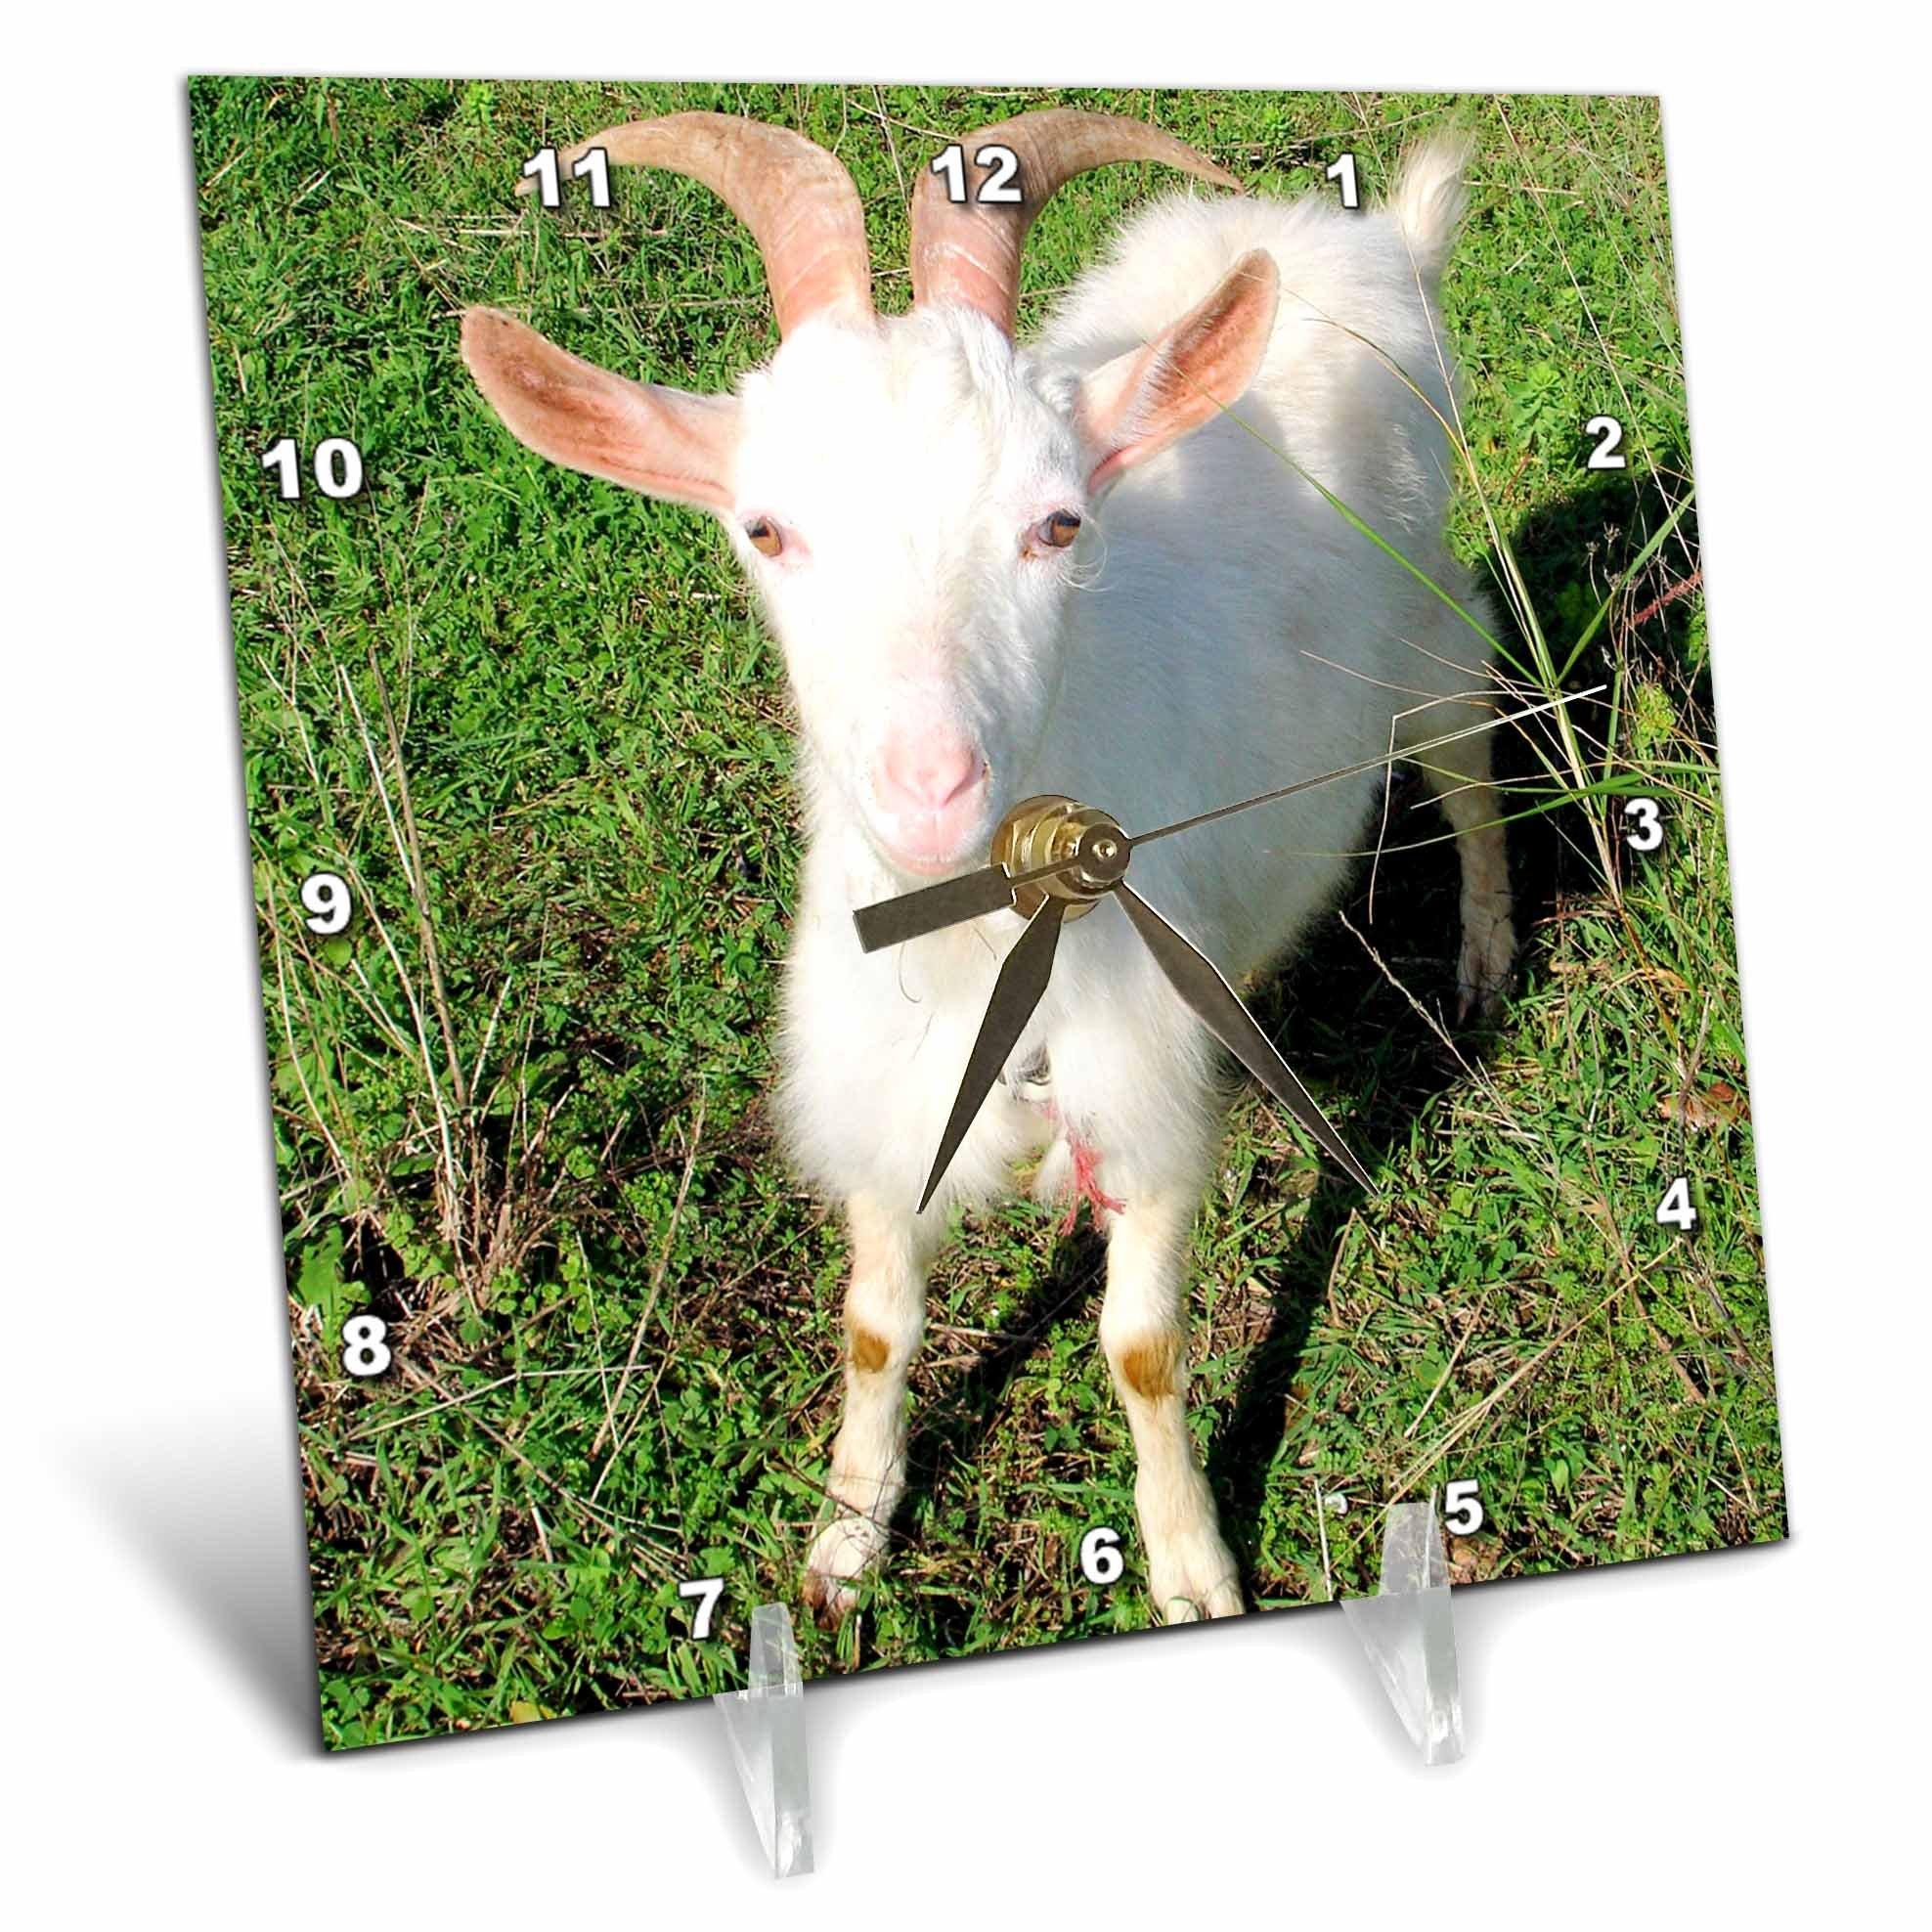 3dRose dc_21325_1 Farm Animals Goat Desk Clock, 6 by 6-Inch by 3dRose